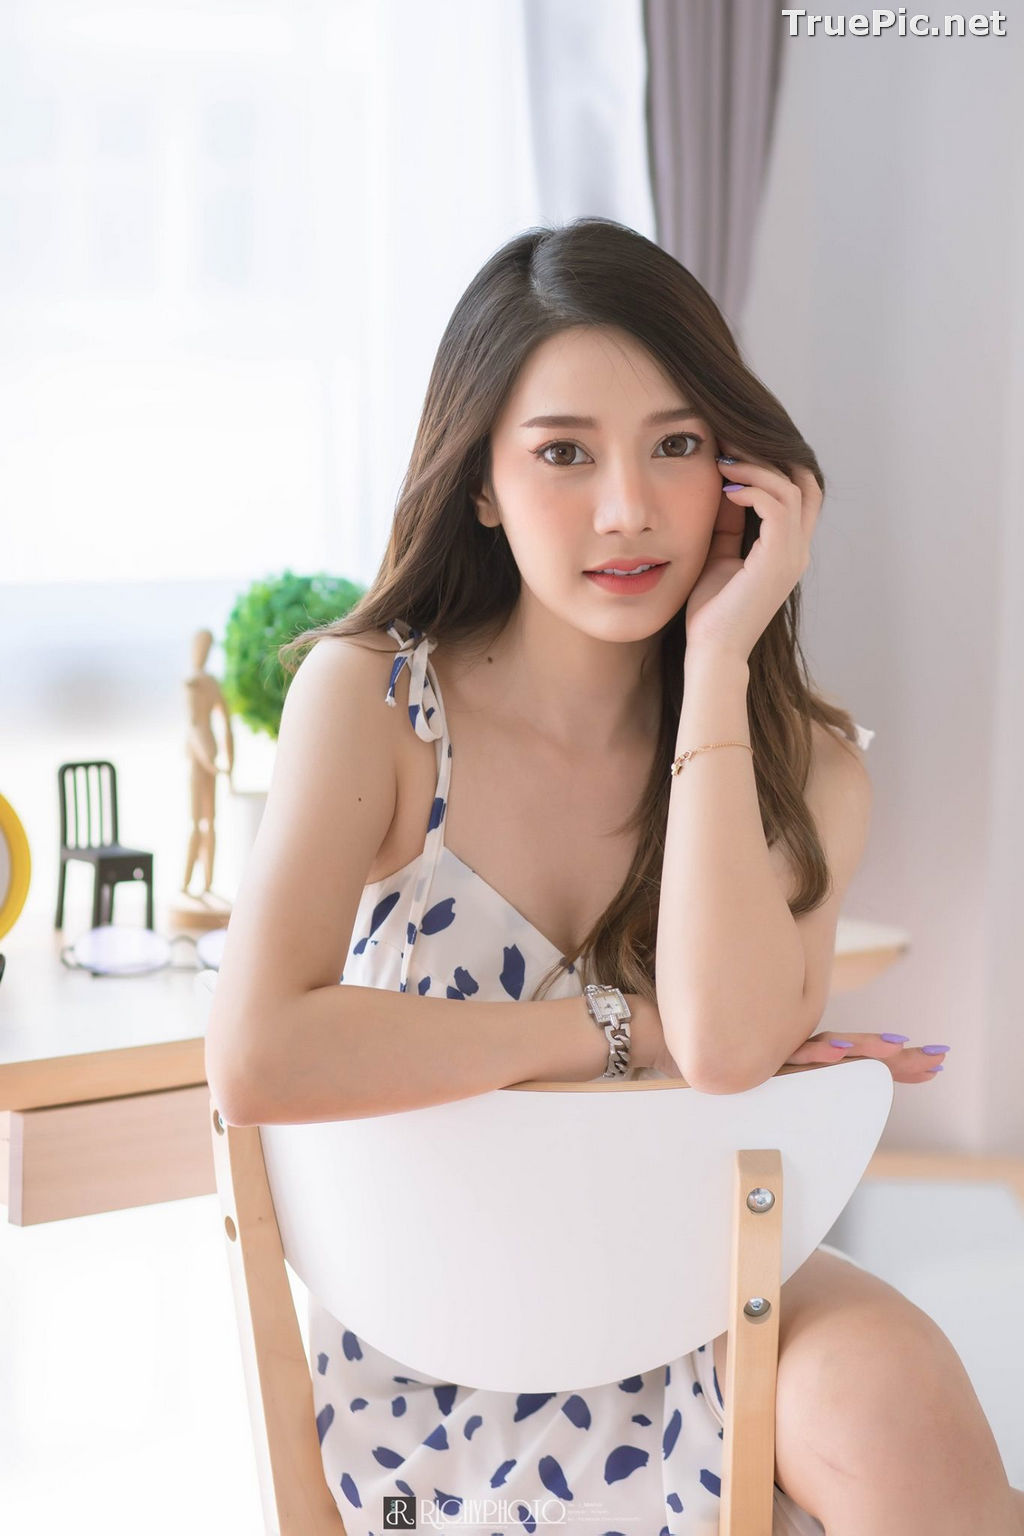 Image Thailand Model - Sasipa Tungmay Jibkrapong - Weekend Morning Dress - TruePic.net - Picture-4